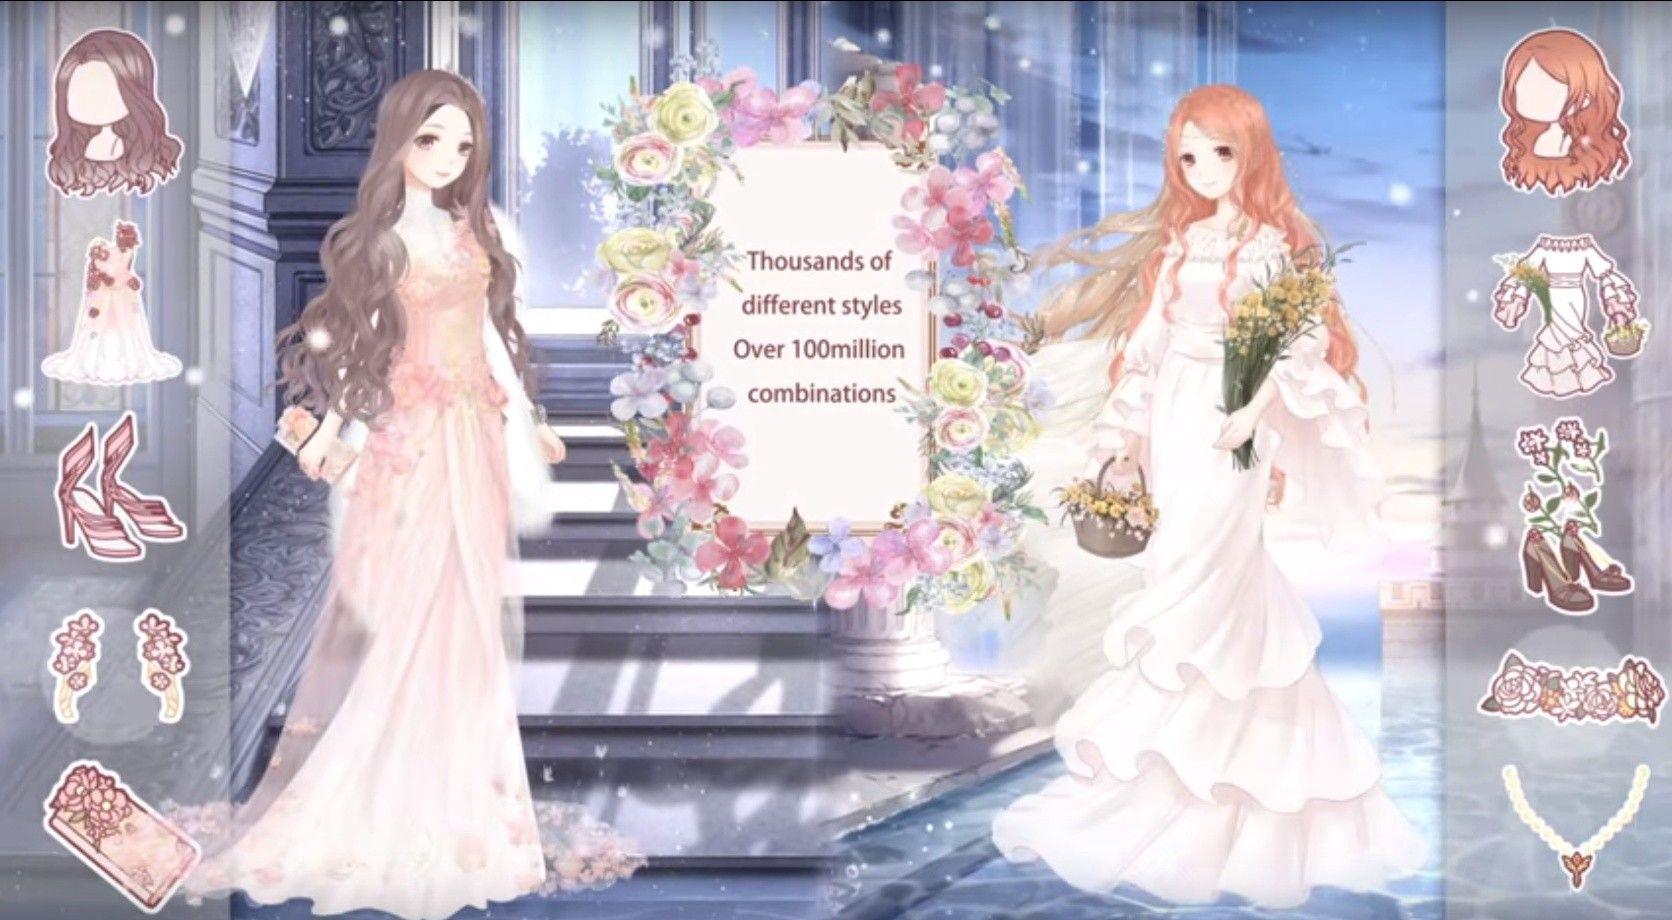 Dress Up Queen With Love Nikki Redeem Codes Lovenikki Codes Redeem List Love Nikki Codes Sept In 2020 Beautiful Wedding Dresses Wedding Dresses Princess Wedding